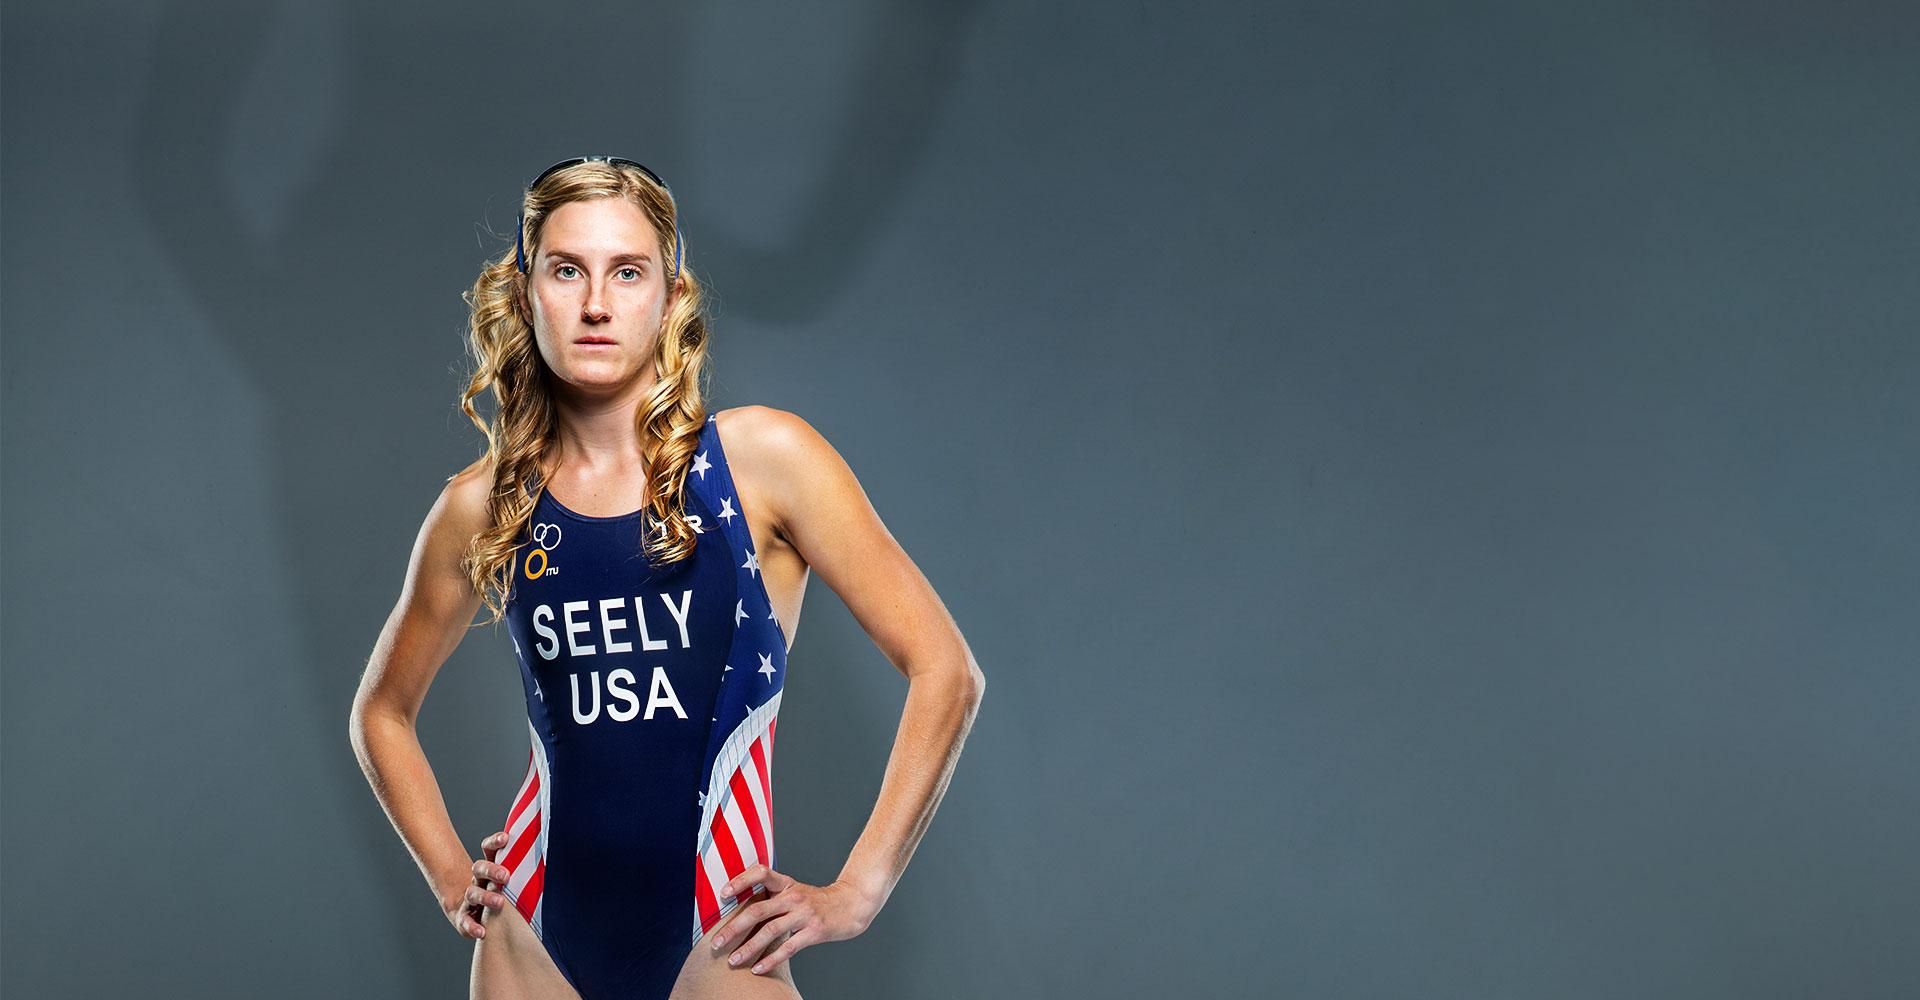 Allysa Seely